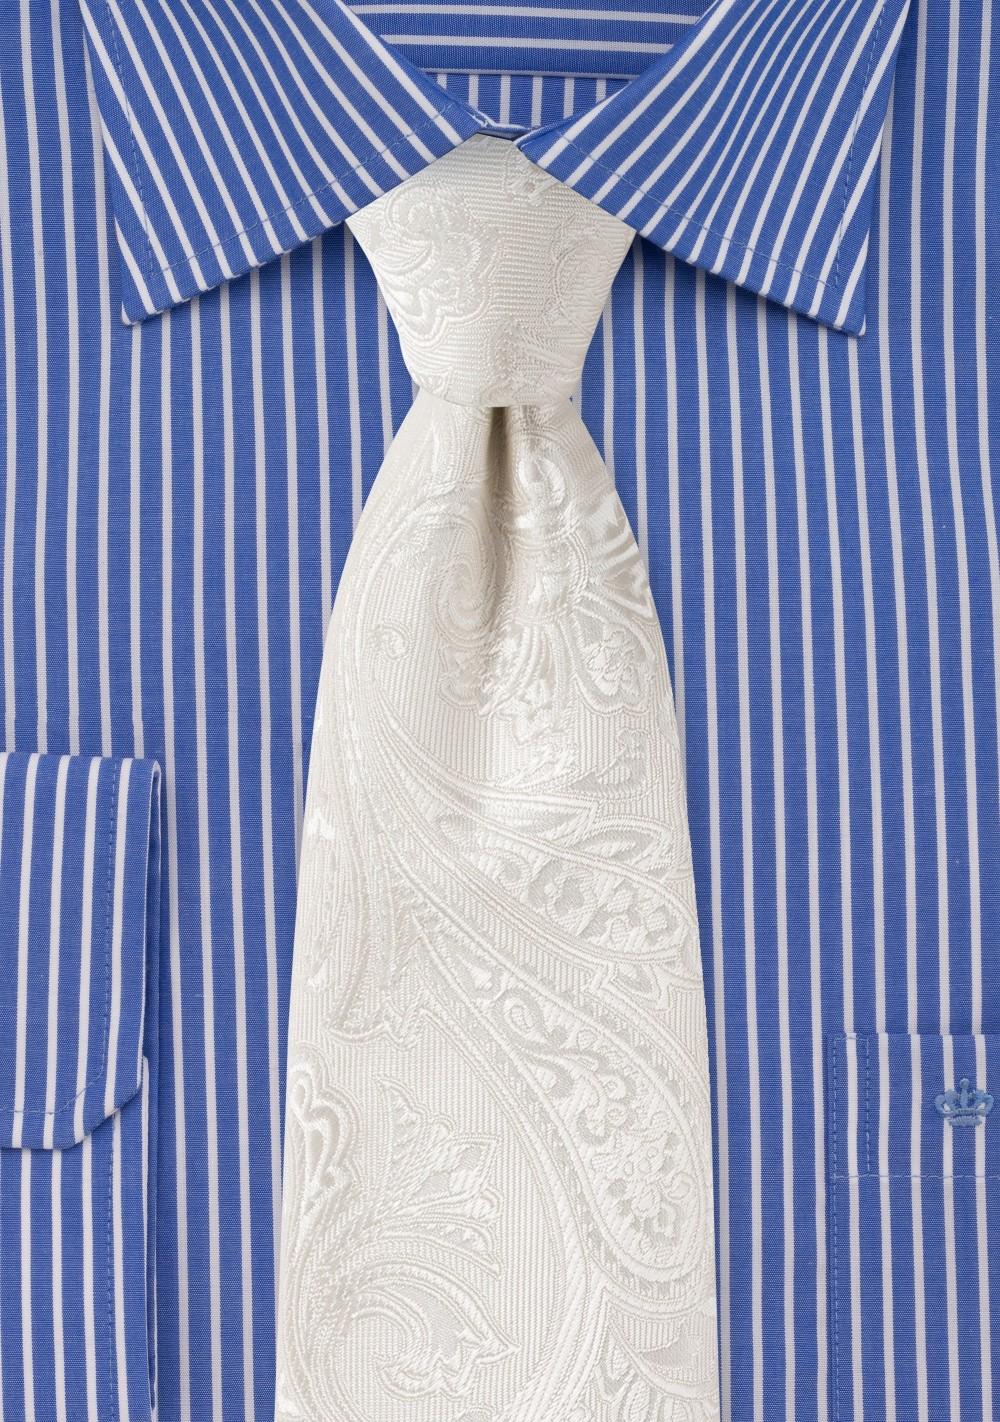 Elegant Woven Paisley Tie in Ivory